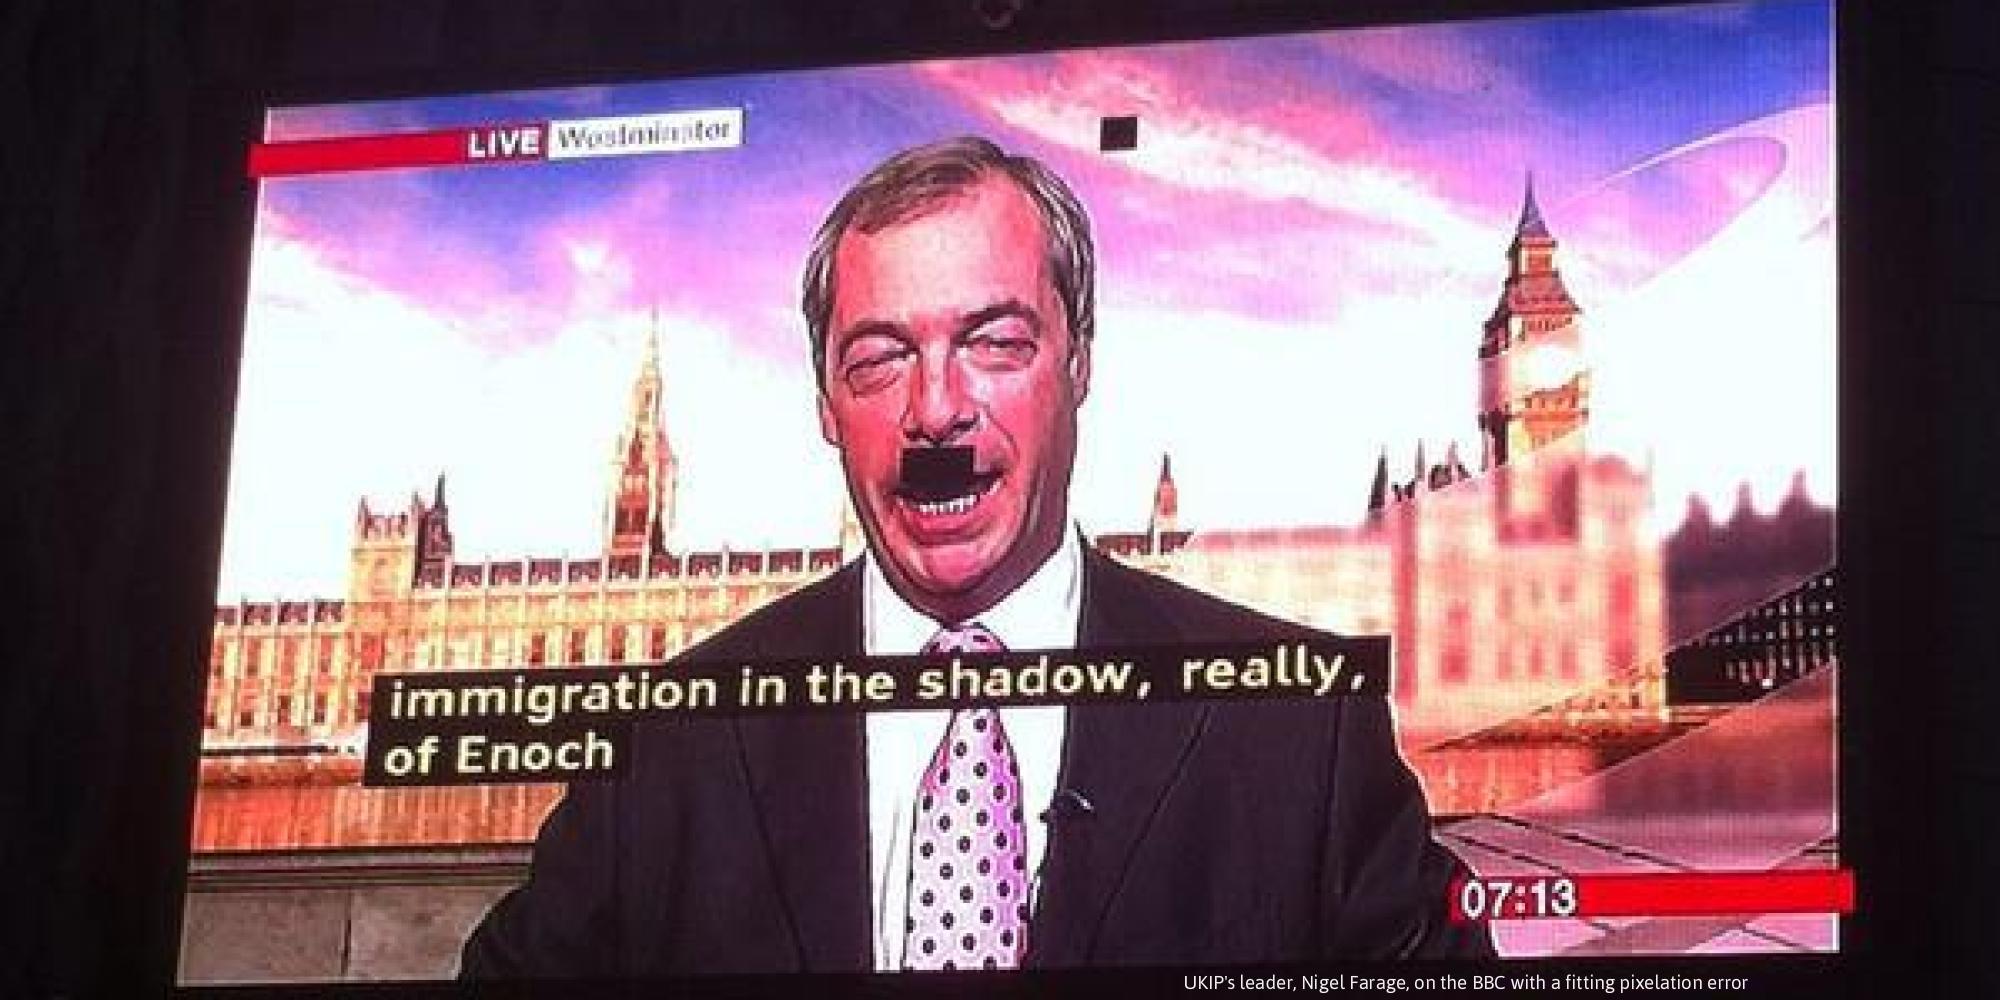 Nigel Farage Hitler Moustache, BBC